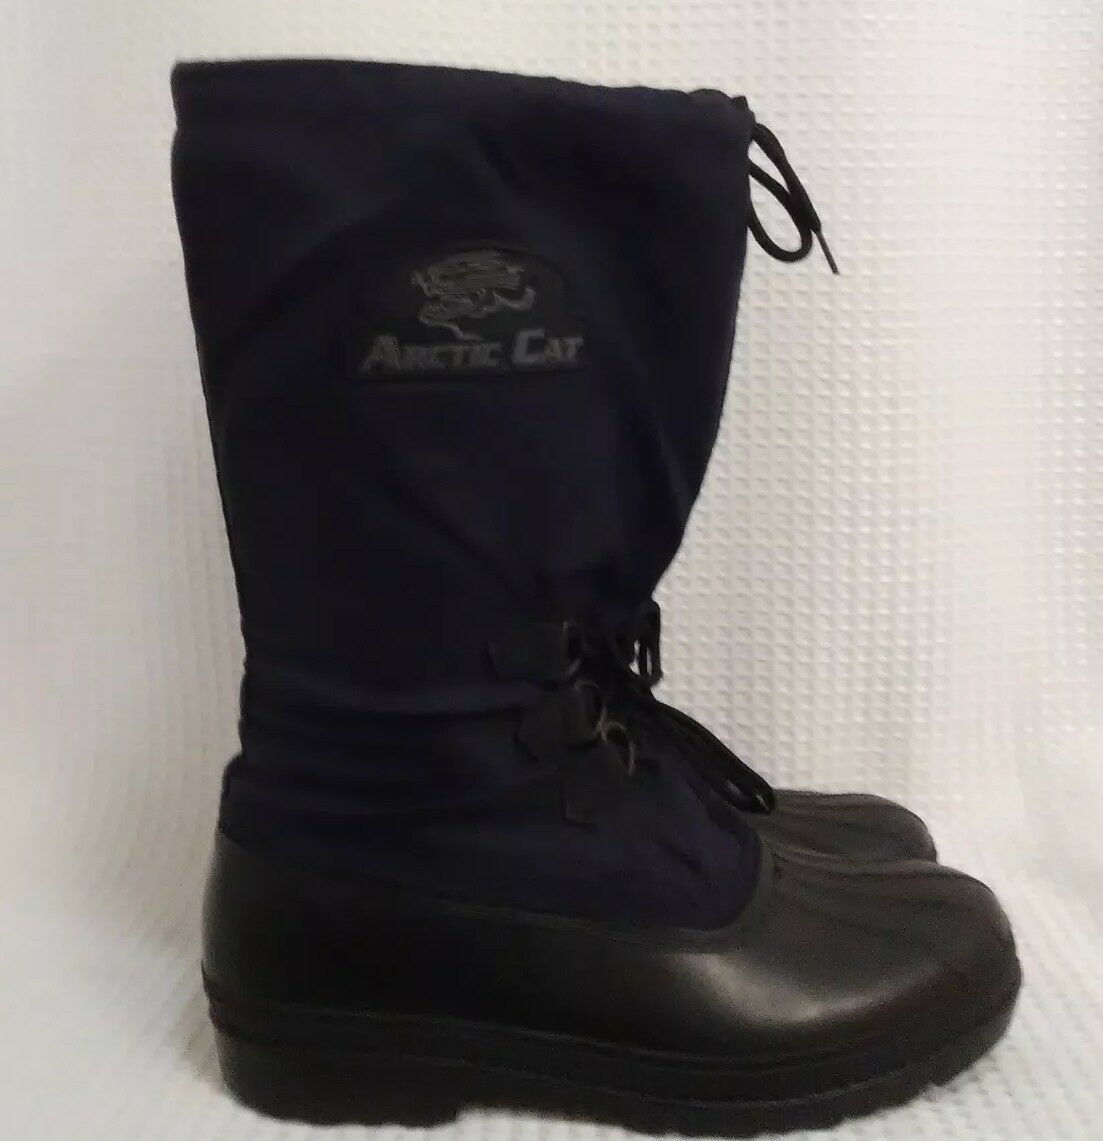 Arctic Cat Black Winter Snow Boots Mens size 11